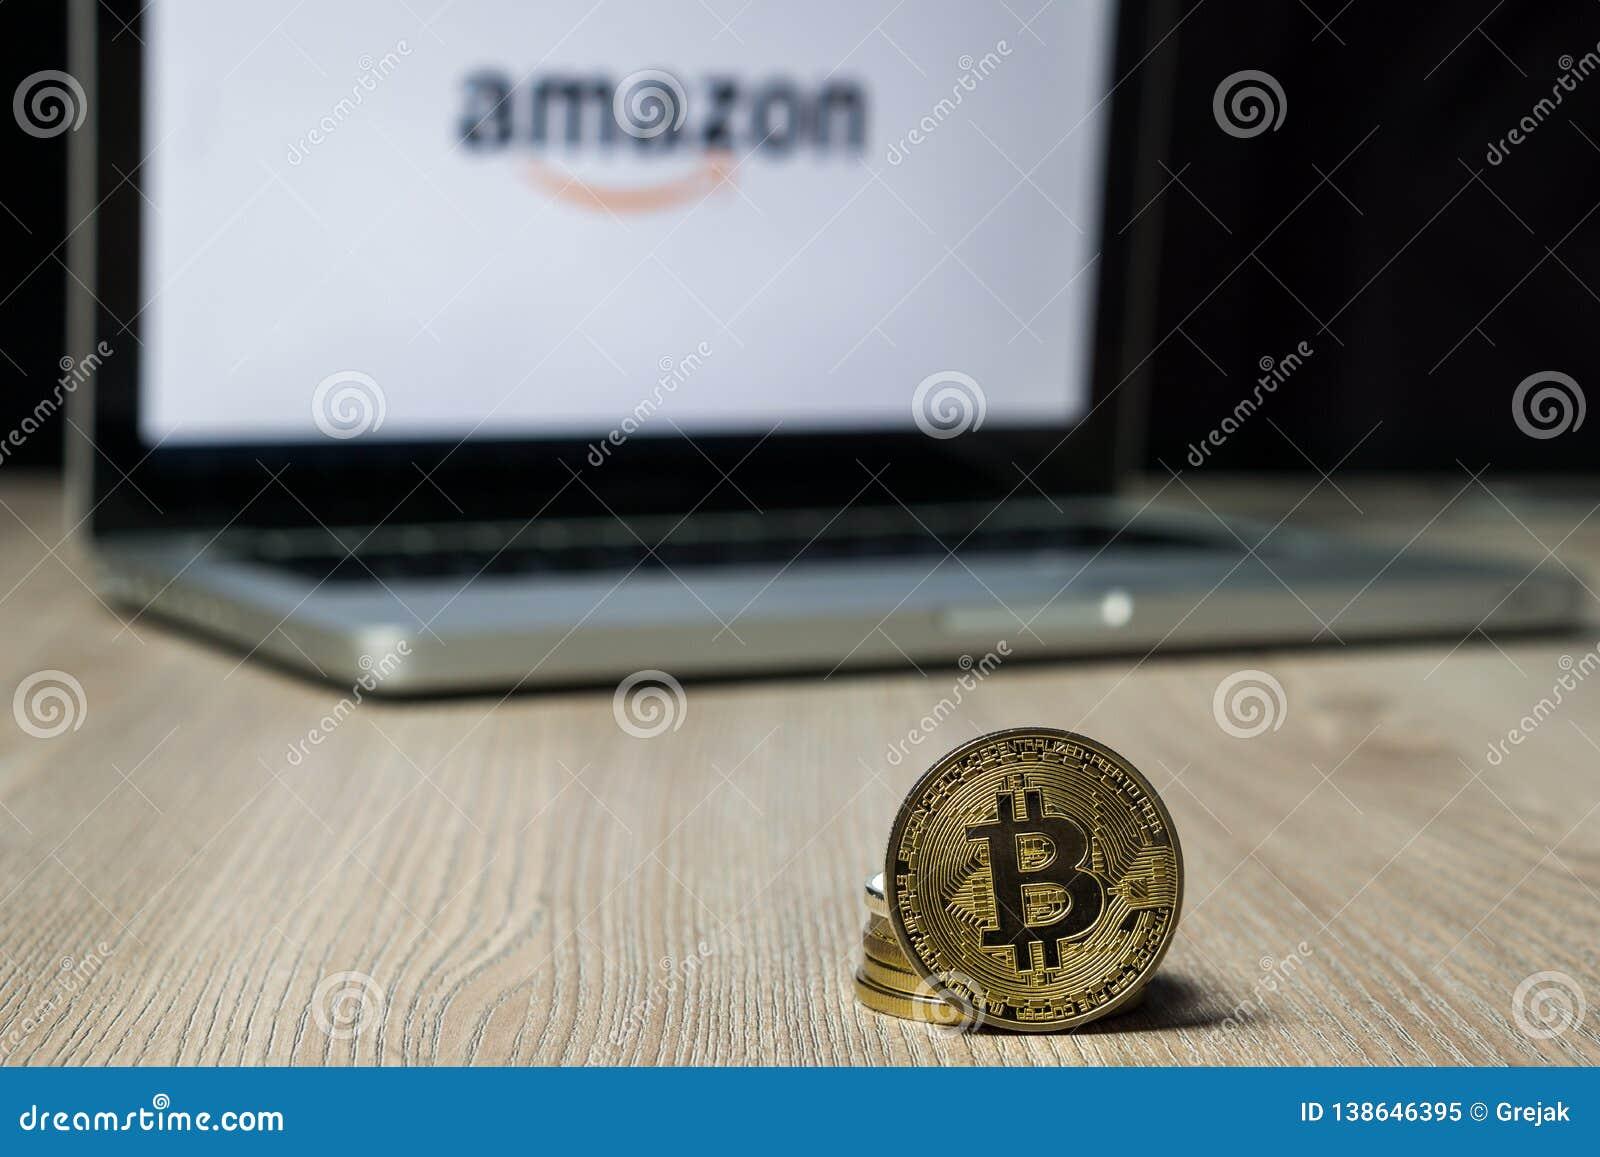 Монетка с логотипом Амазонки на экране ноутбука, Словения - 23-ье декабря 2018 Bitcoin